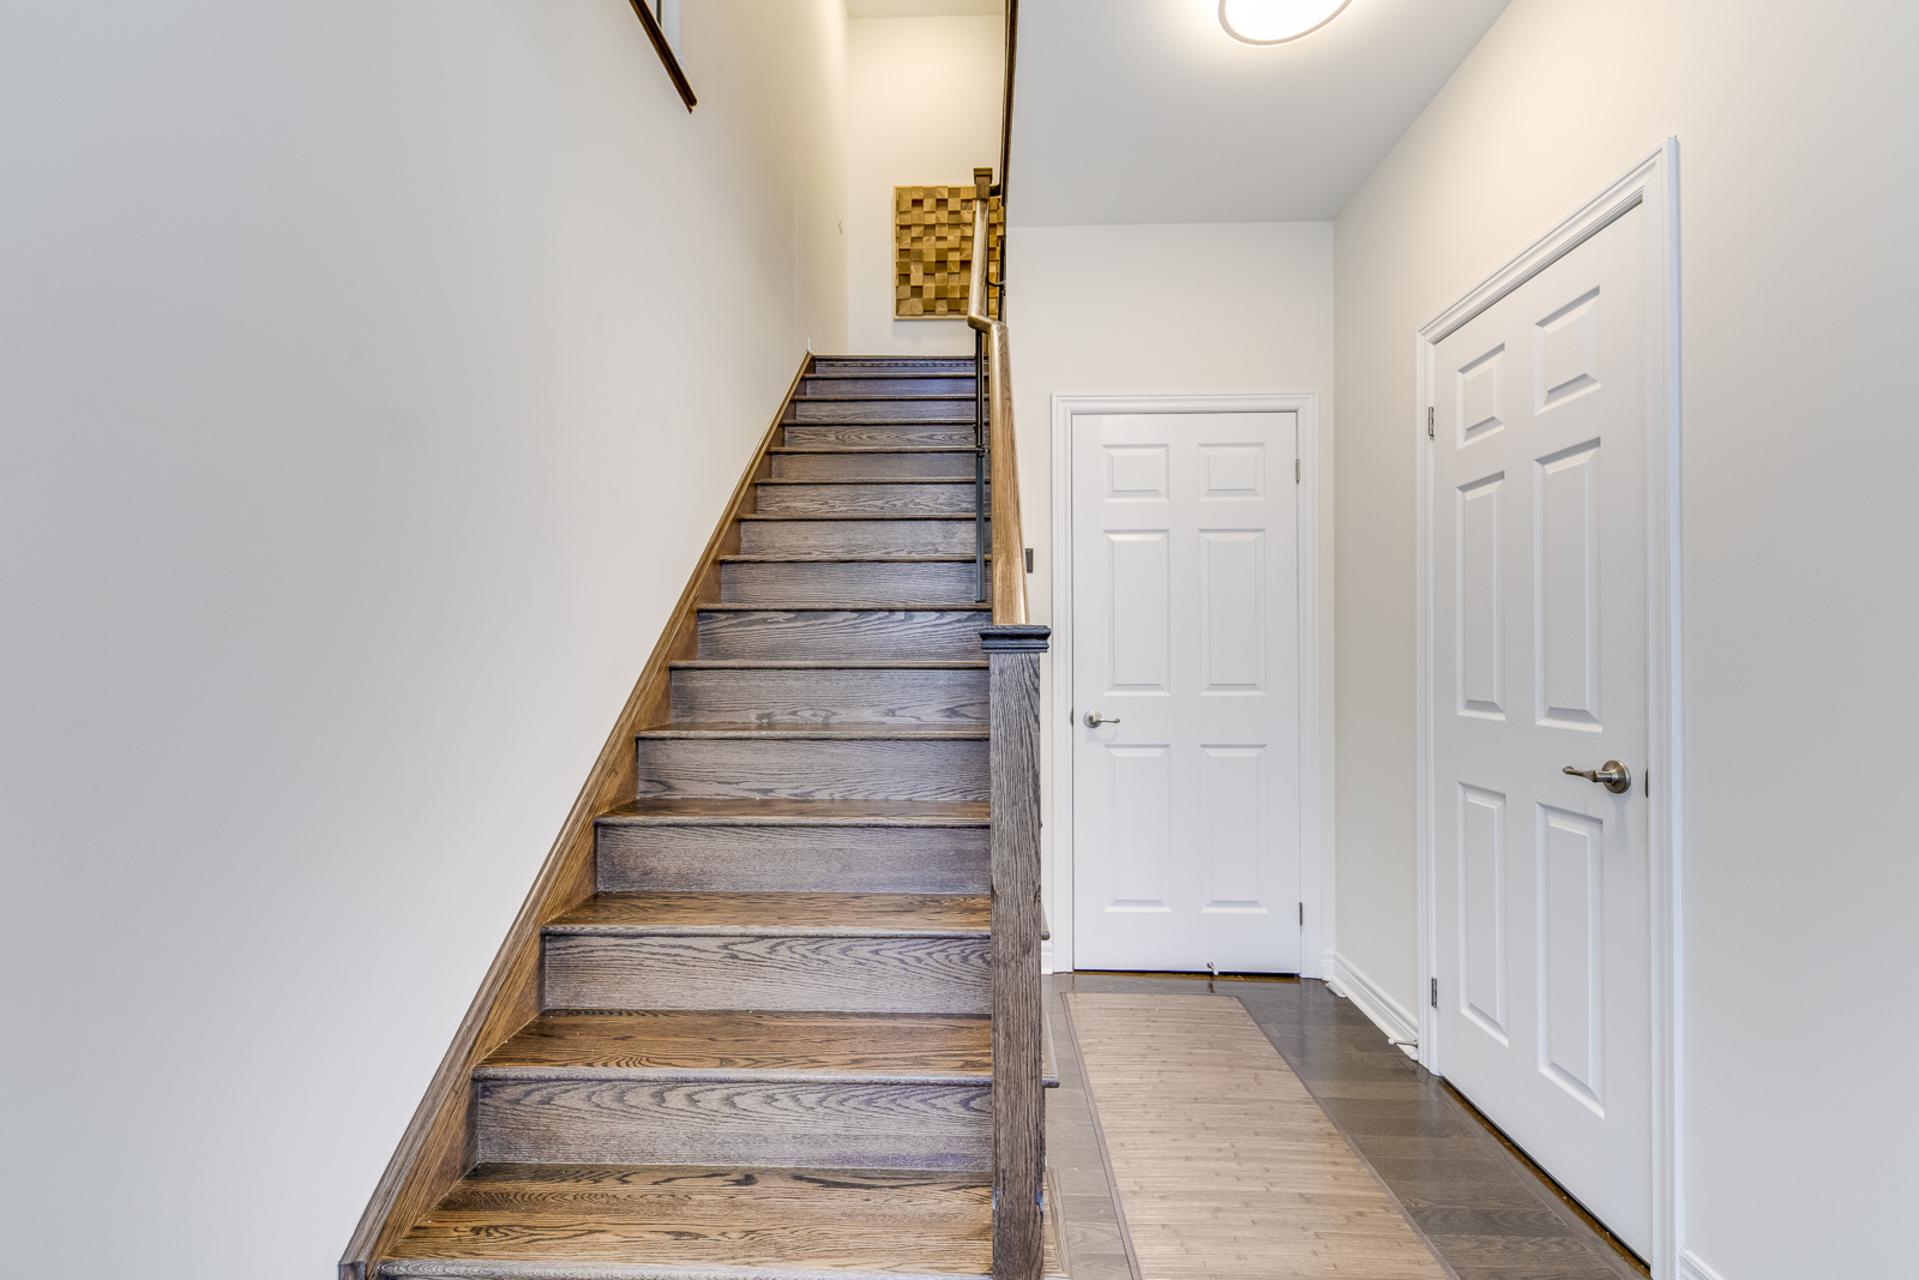 Stairs - 207 Jessie Caverhill Pass, Oakville - Elite3 & Team at 207 Jessie Caverhill Pass, Rural Oakville, Oakville